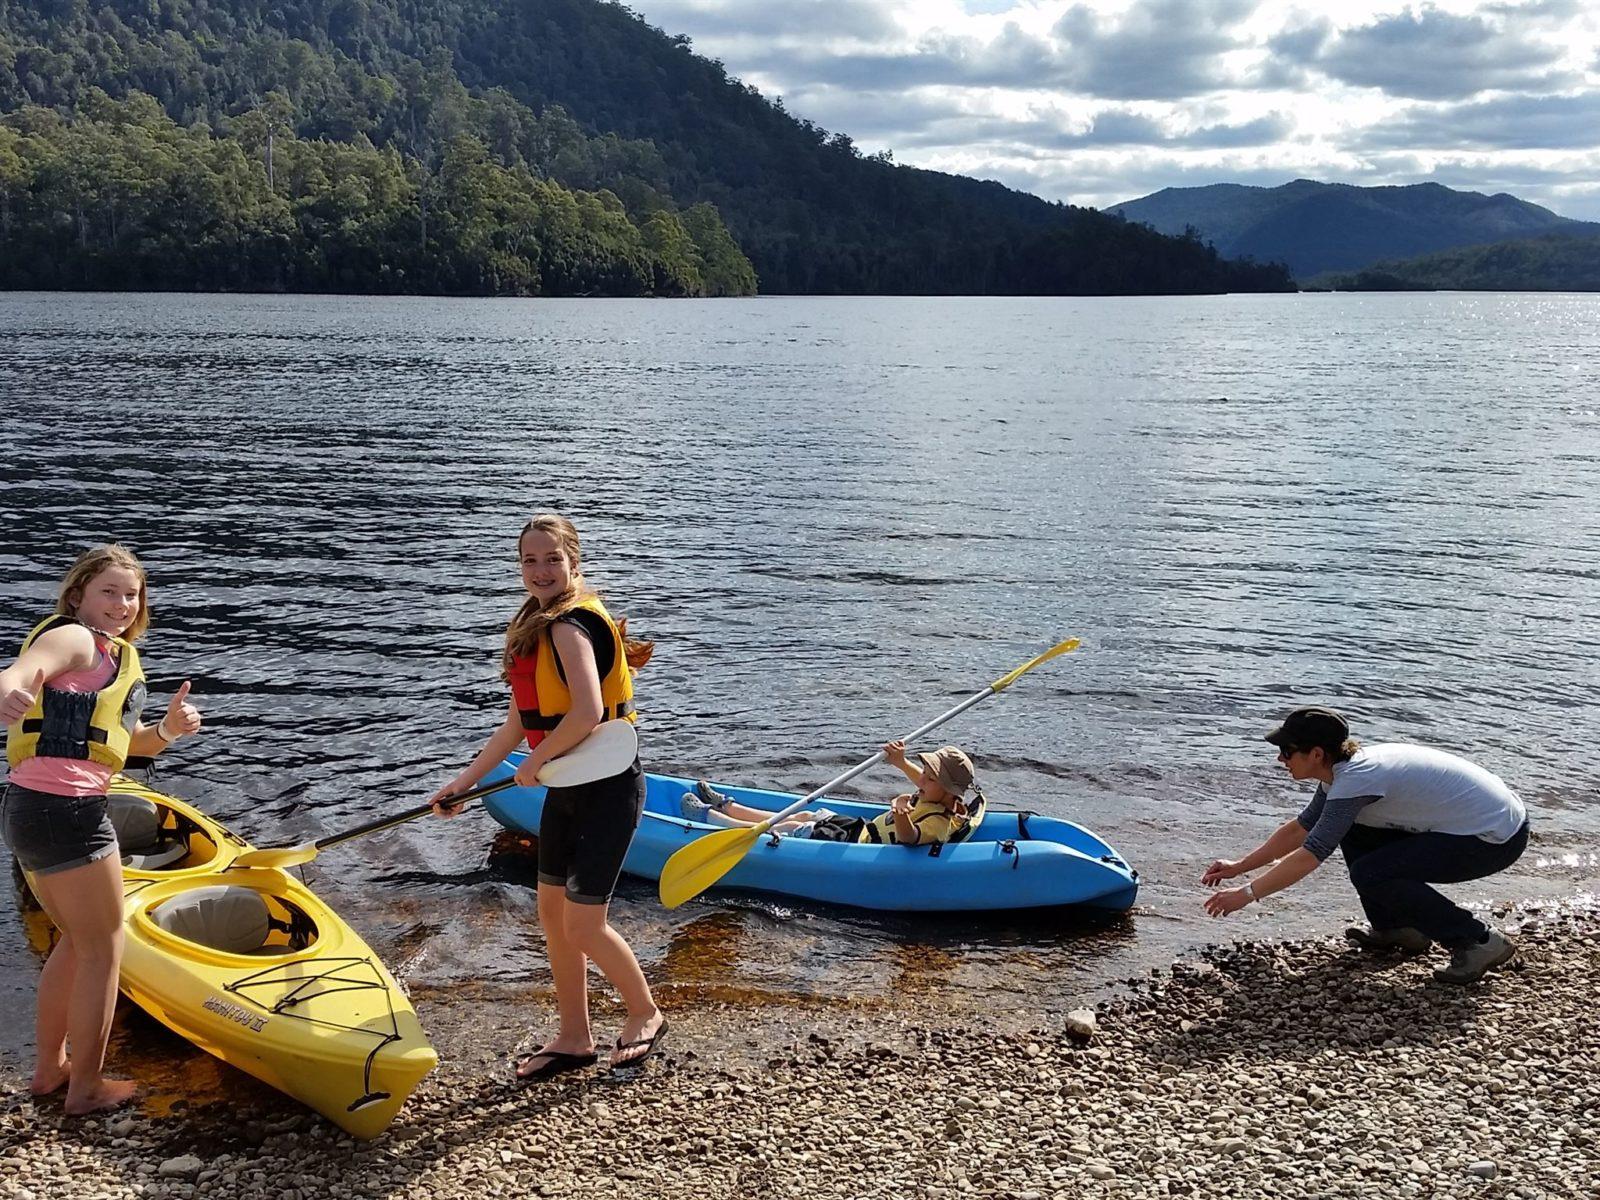 Water sports on Lake Rosebery